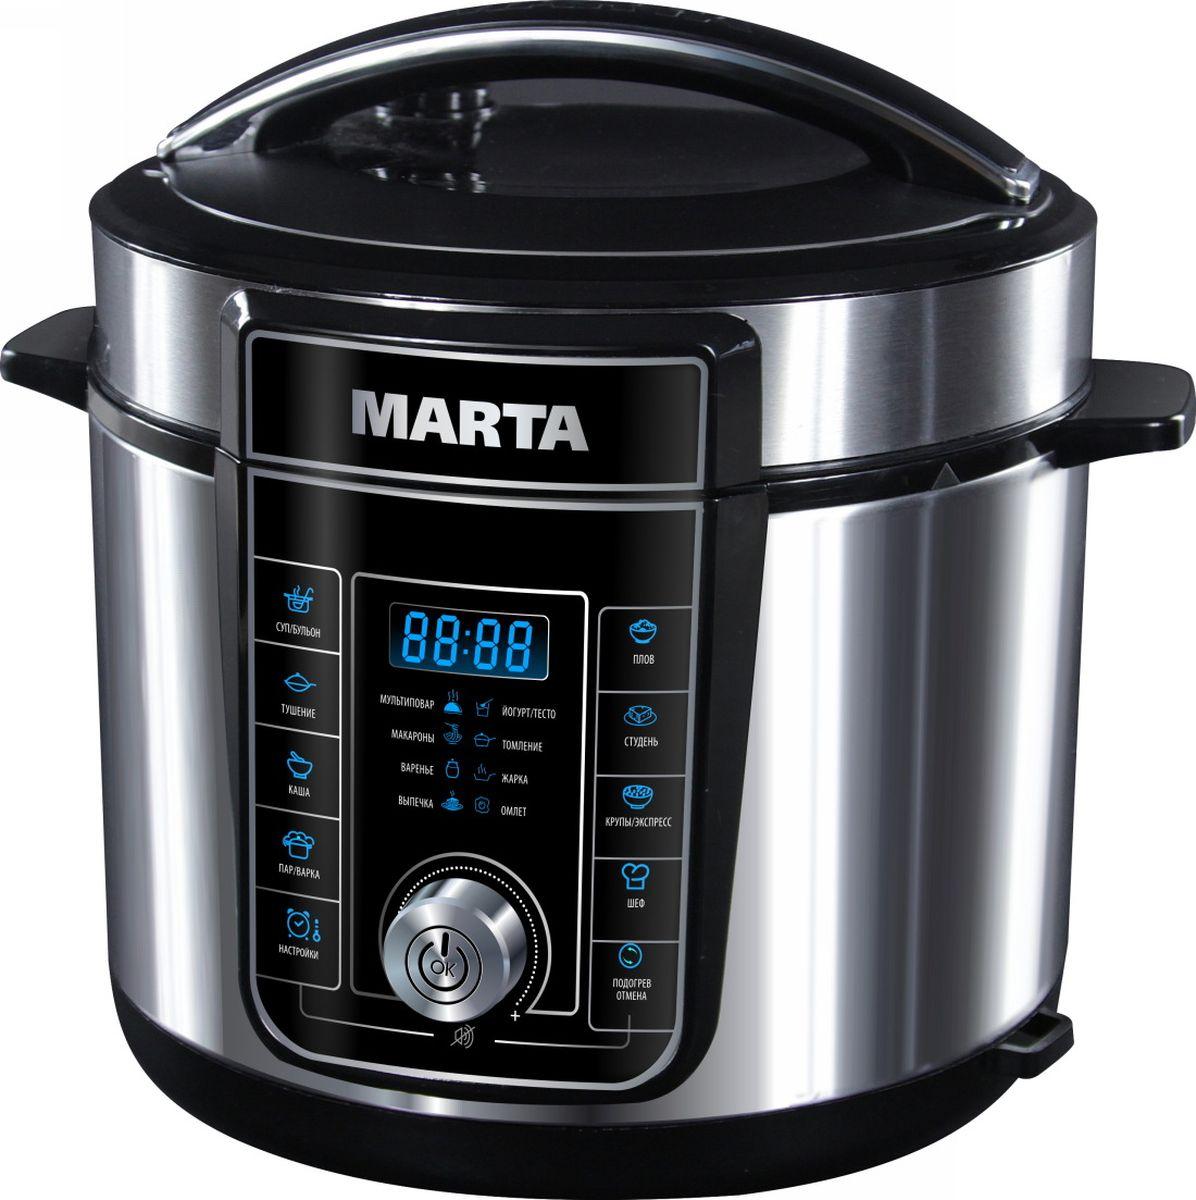 Marta MT-4321, Black Pearl мультиварка